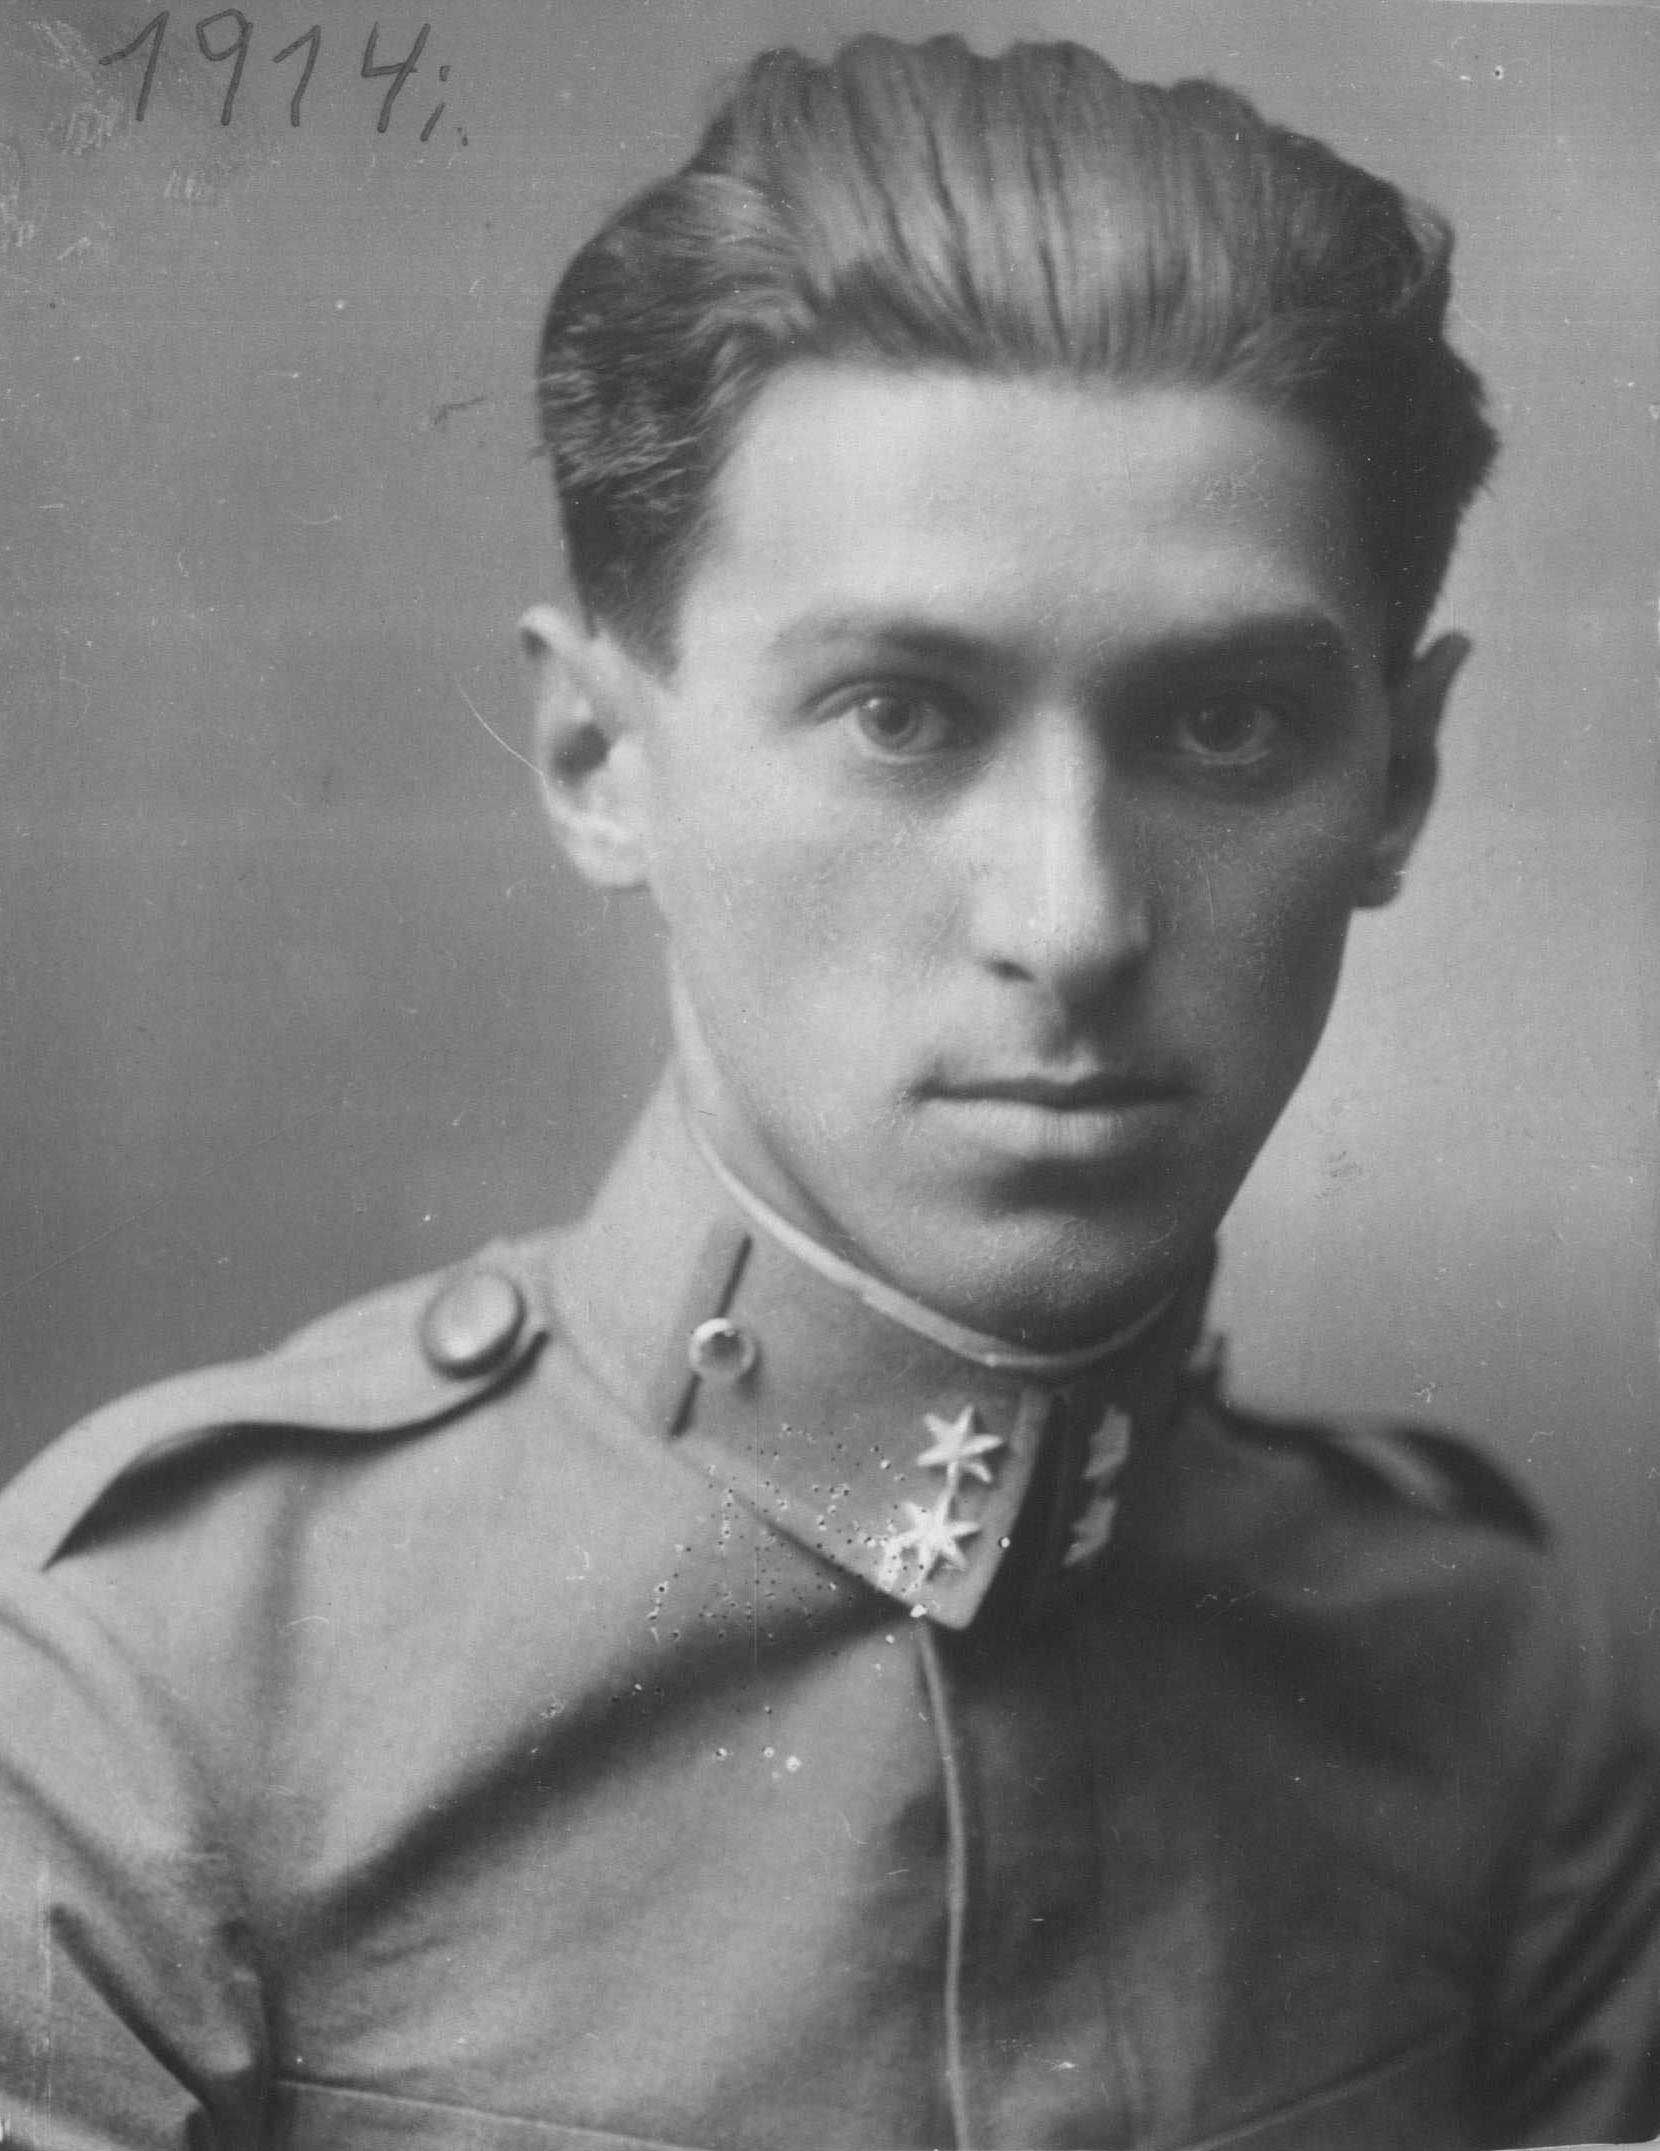 milos-crnjanski-1914.jpg